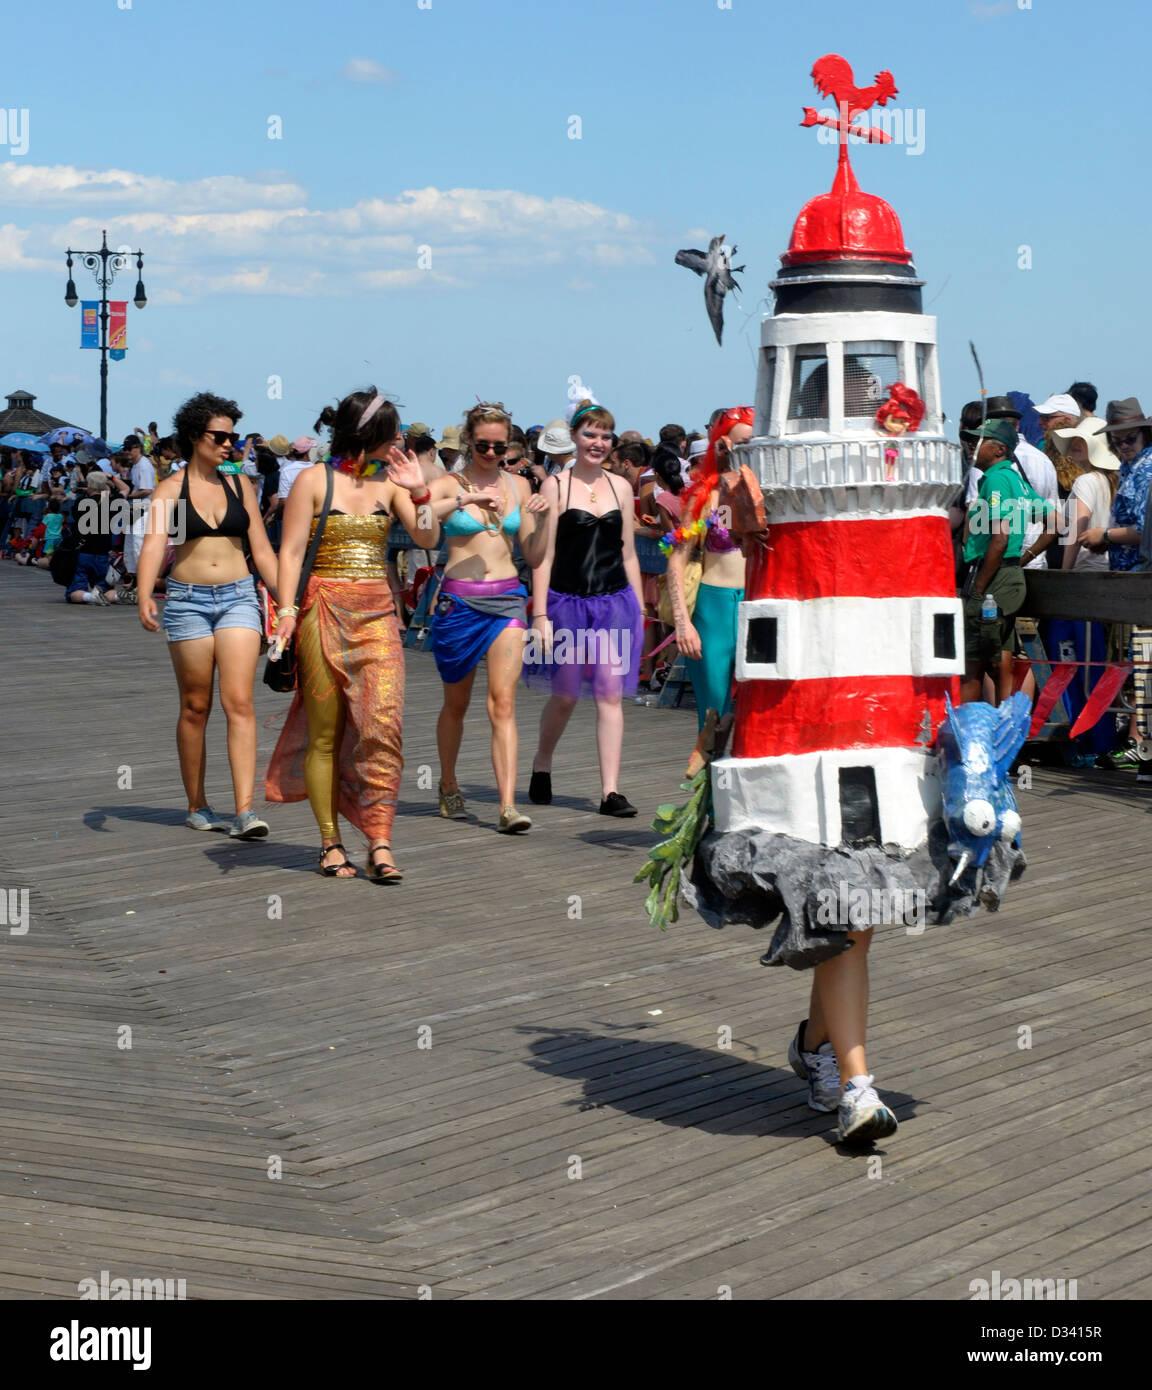 Coney Island Mermaid Parade, photographed: Best Sea Creature: Lighthouse. Stock Photo